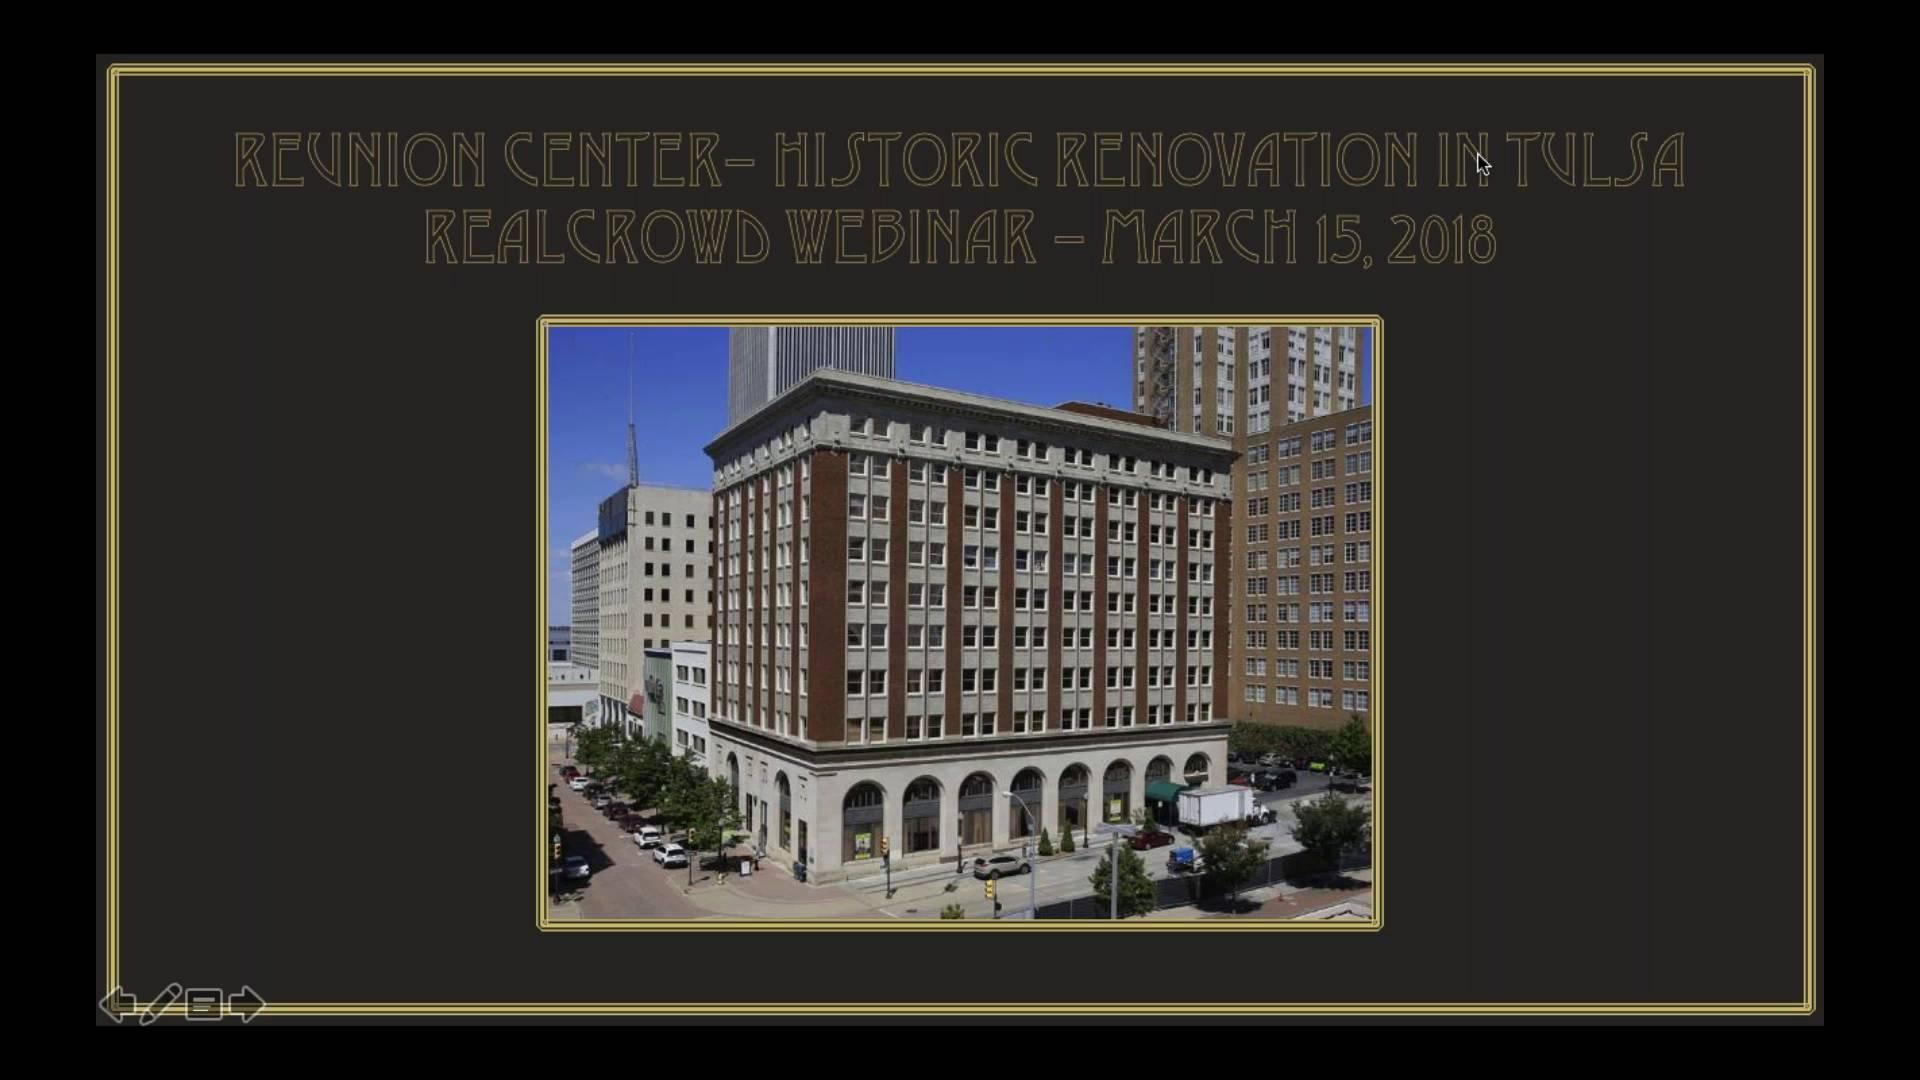 Investment Video - Reunion Center - Historic Renovation in Tulsa